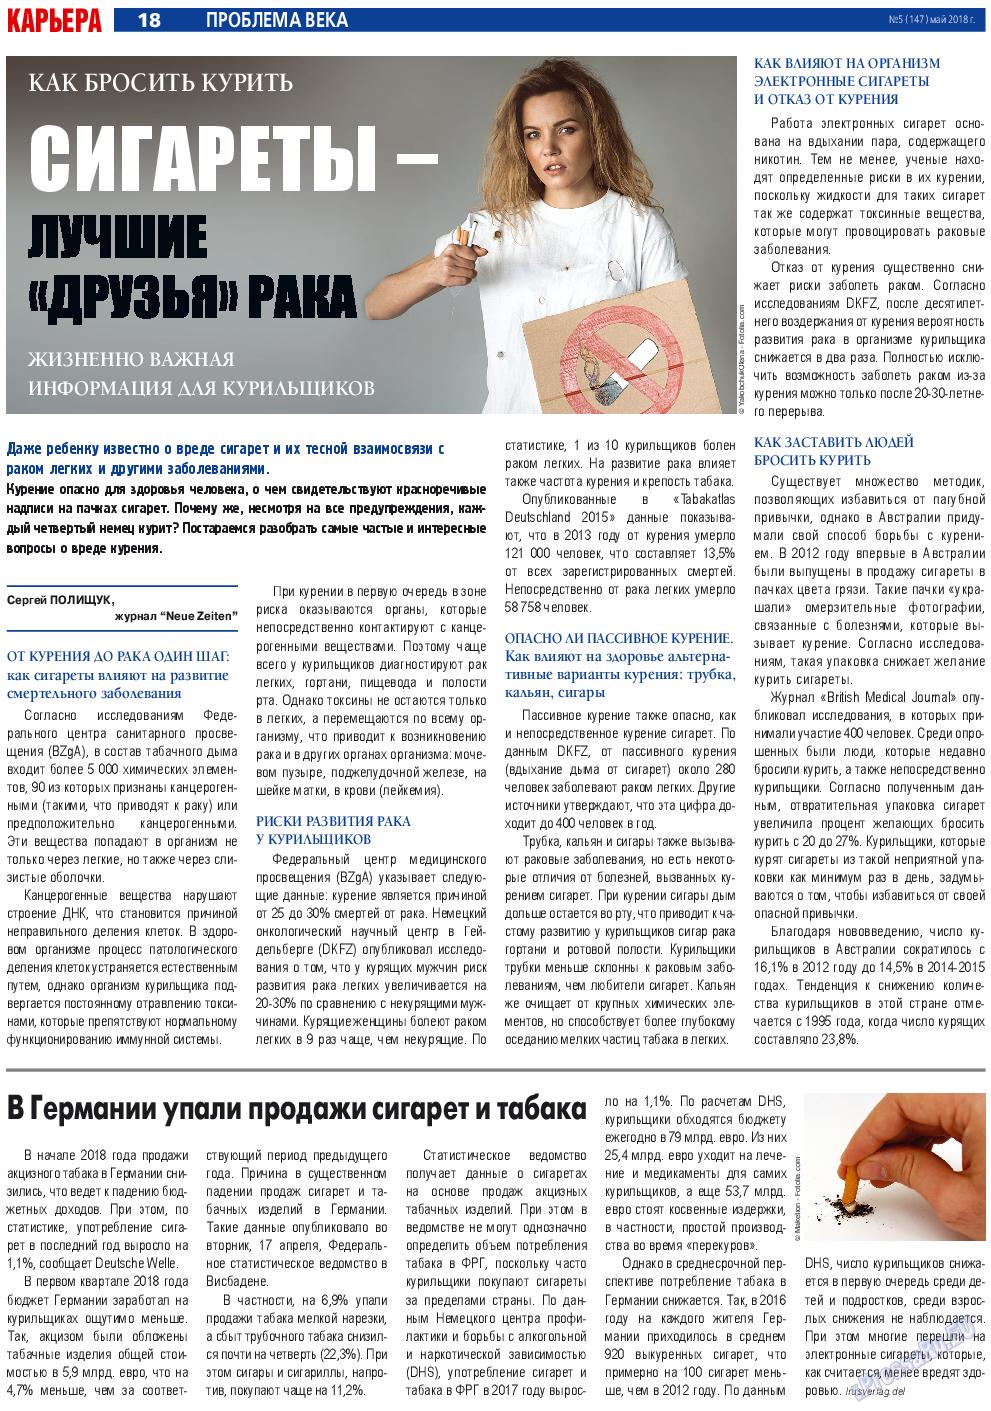 Карьера (газета). 2018 год, номер 5, стр. 18